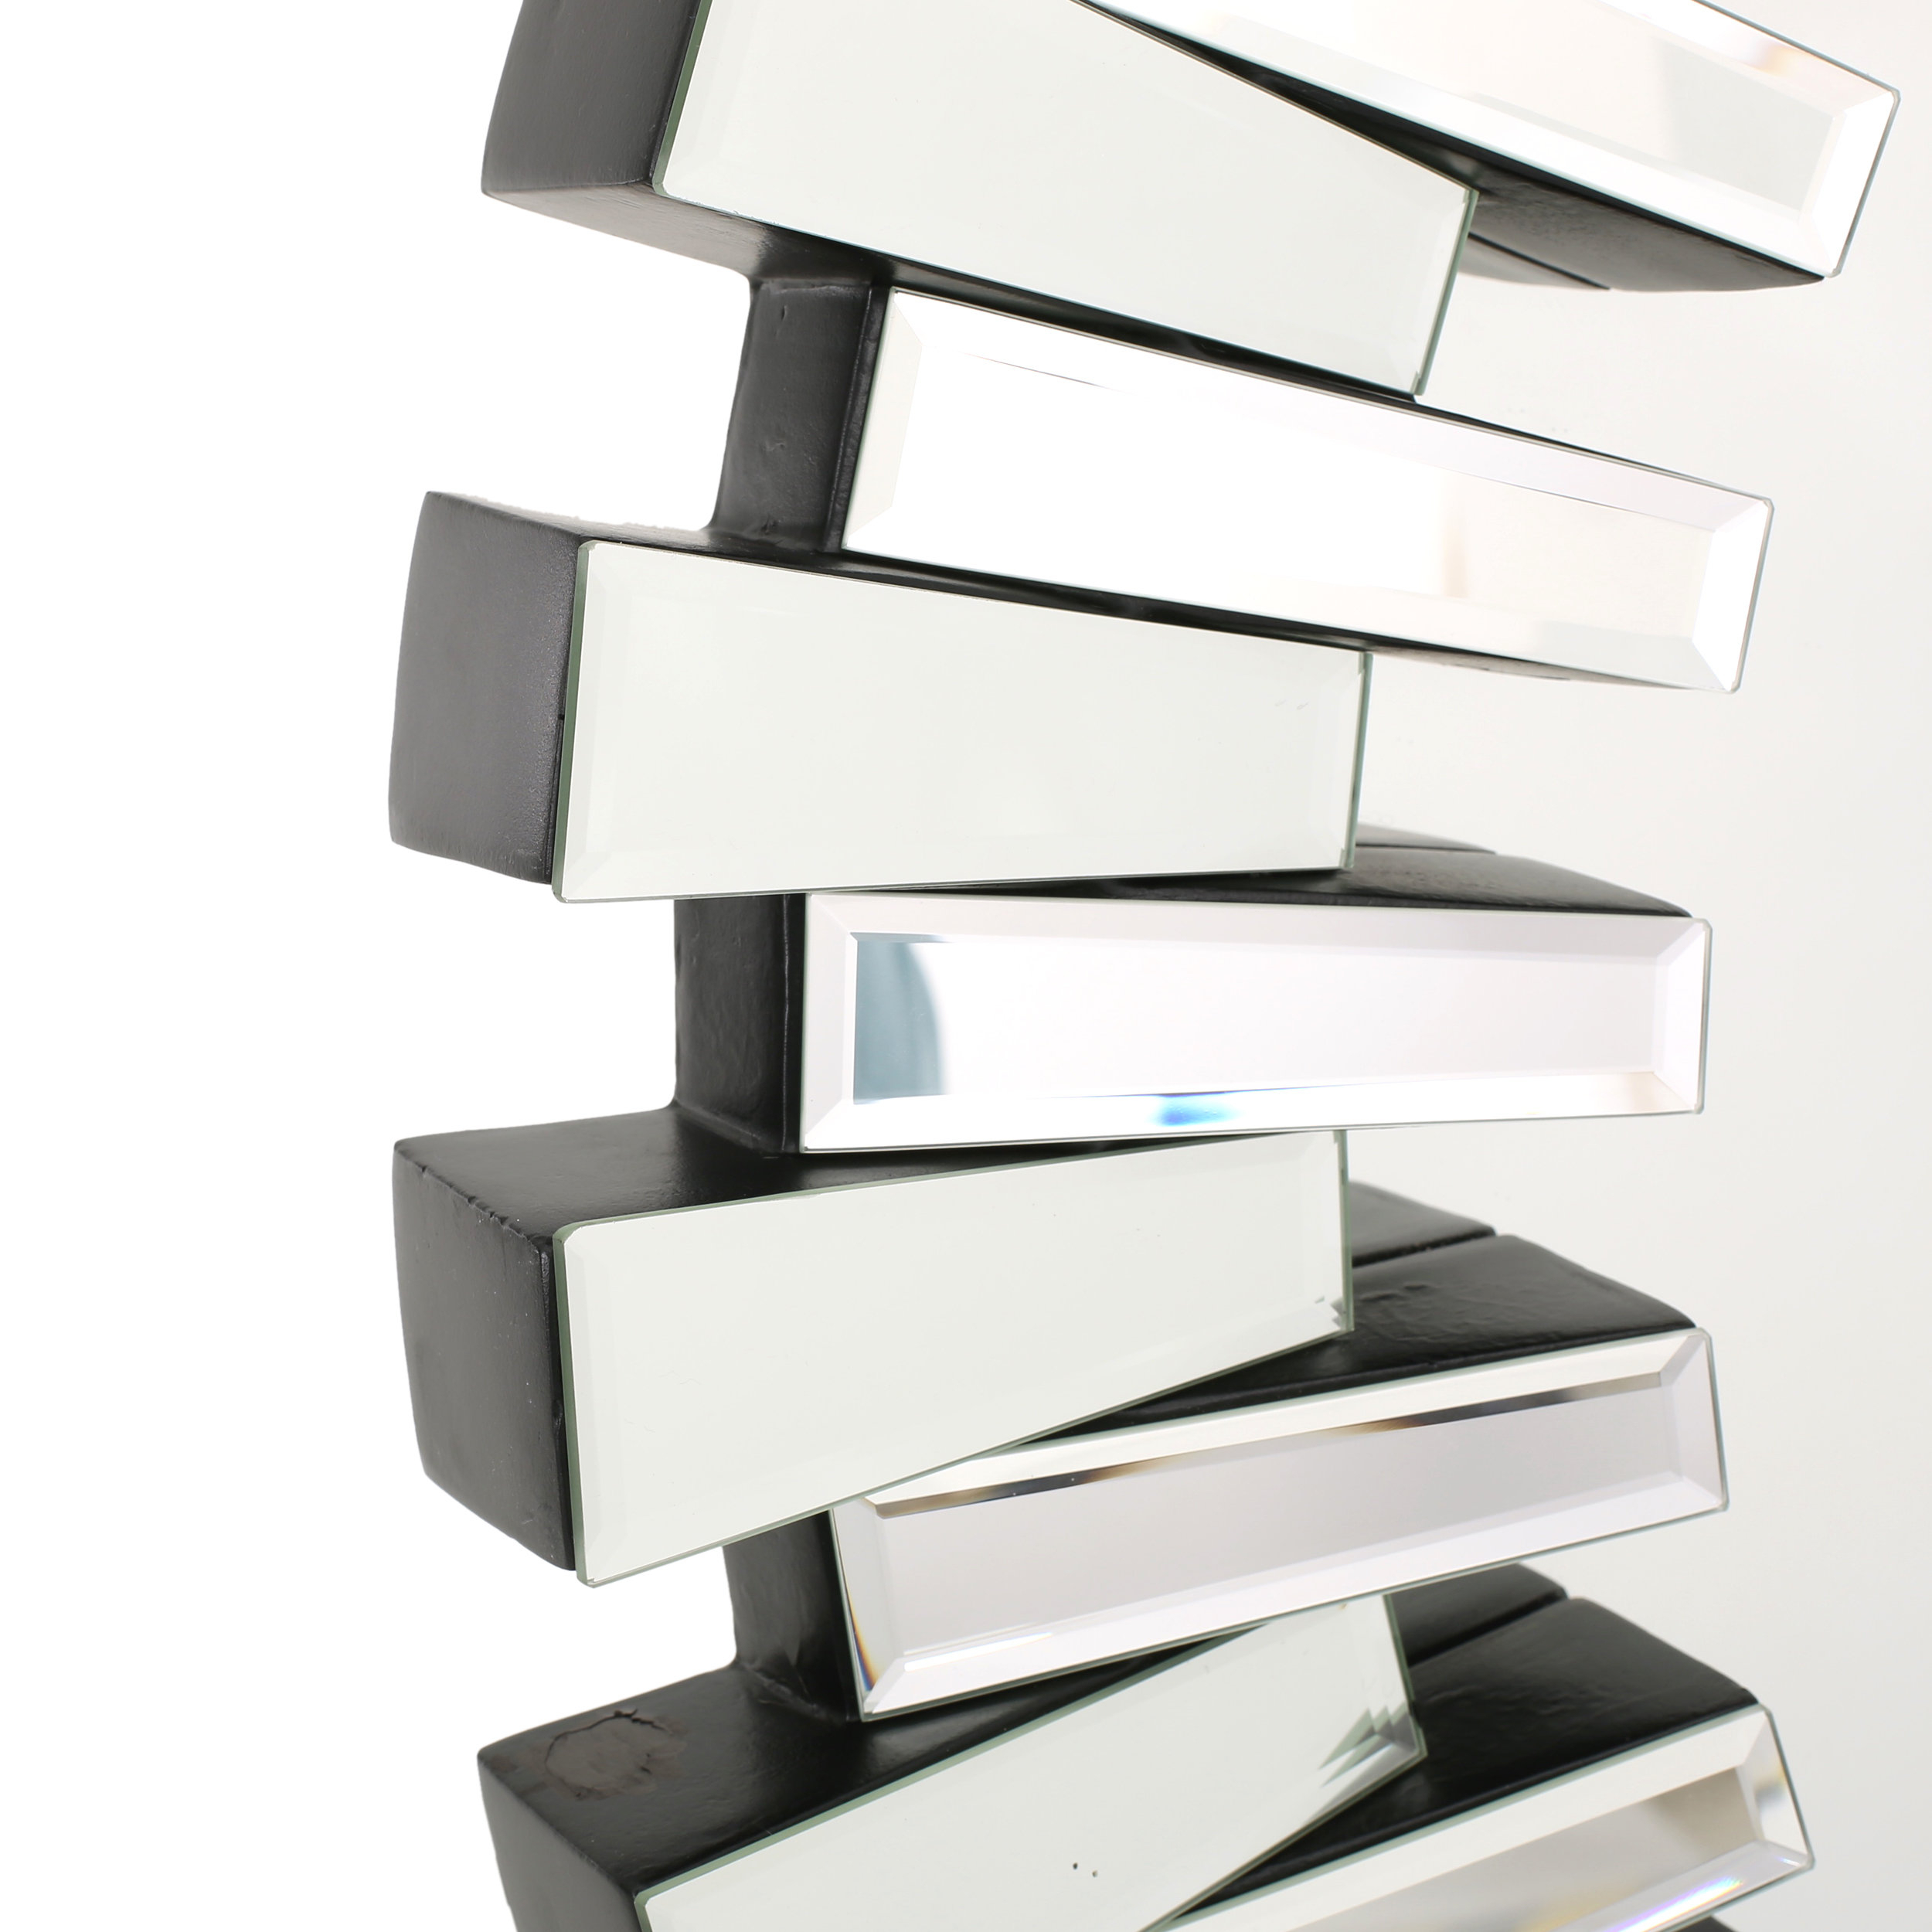 Willa Arlo Interiors Deniece Sunburst Round Wall Mirror Regarding Deniece Sunburst Round Wall Mirrors (View 29 of 30)